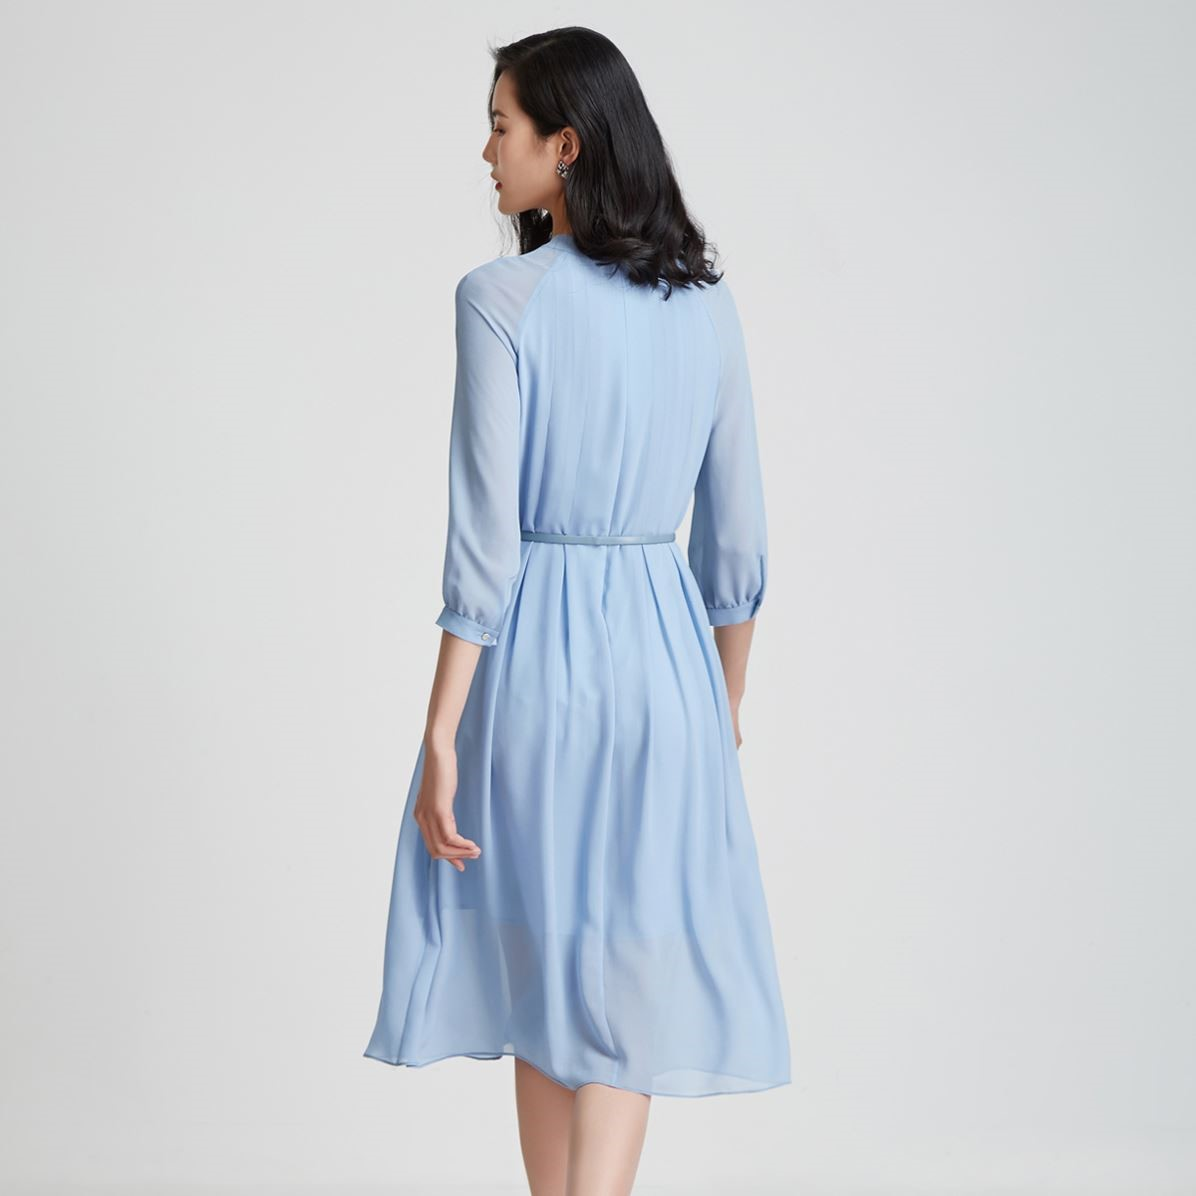 BBLLUUEE/粉蓝衣橱飘带领雪纺连衣裙女2021夏新款七分袖大摆A字裙